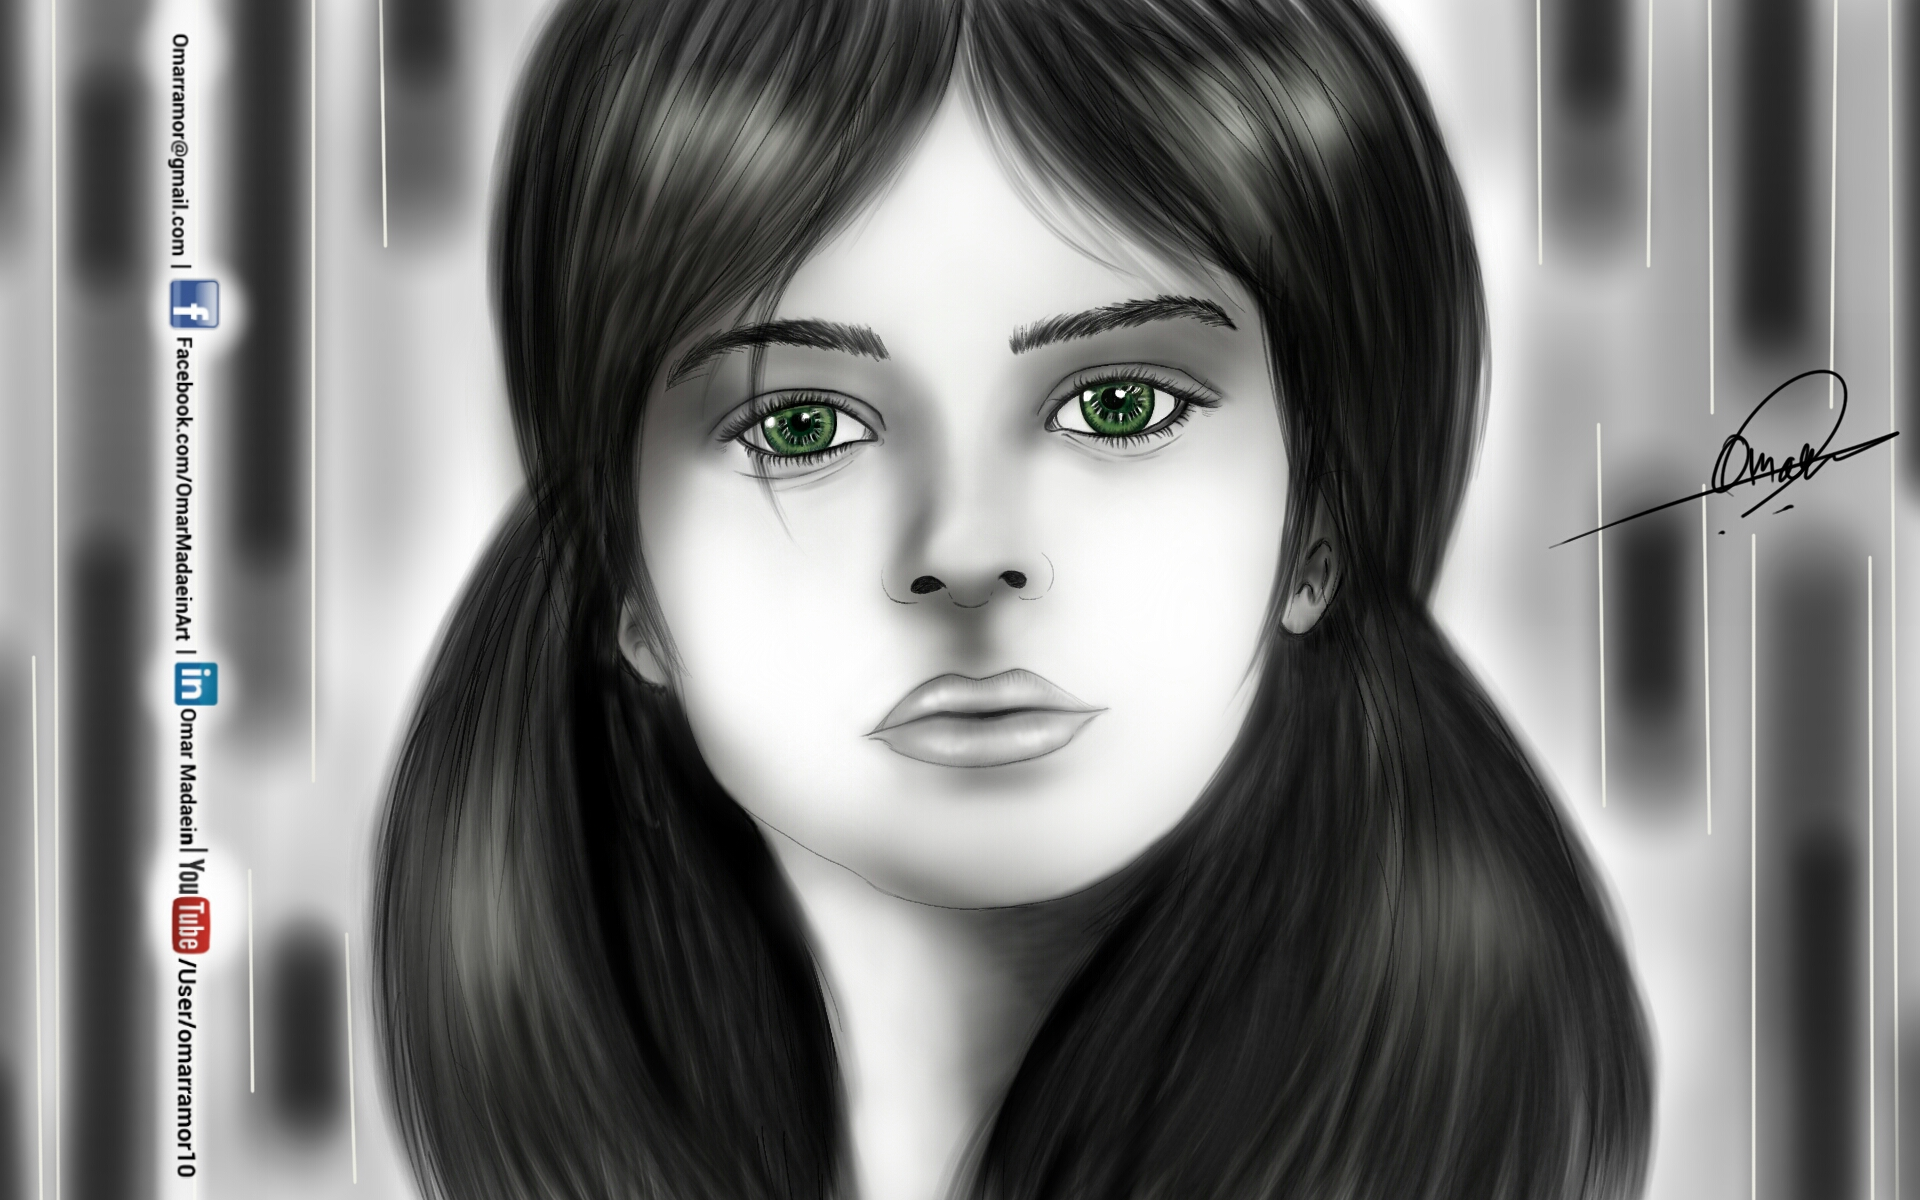 green eyes - Drawing by Omar